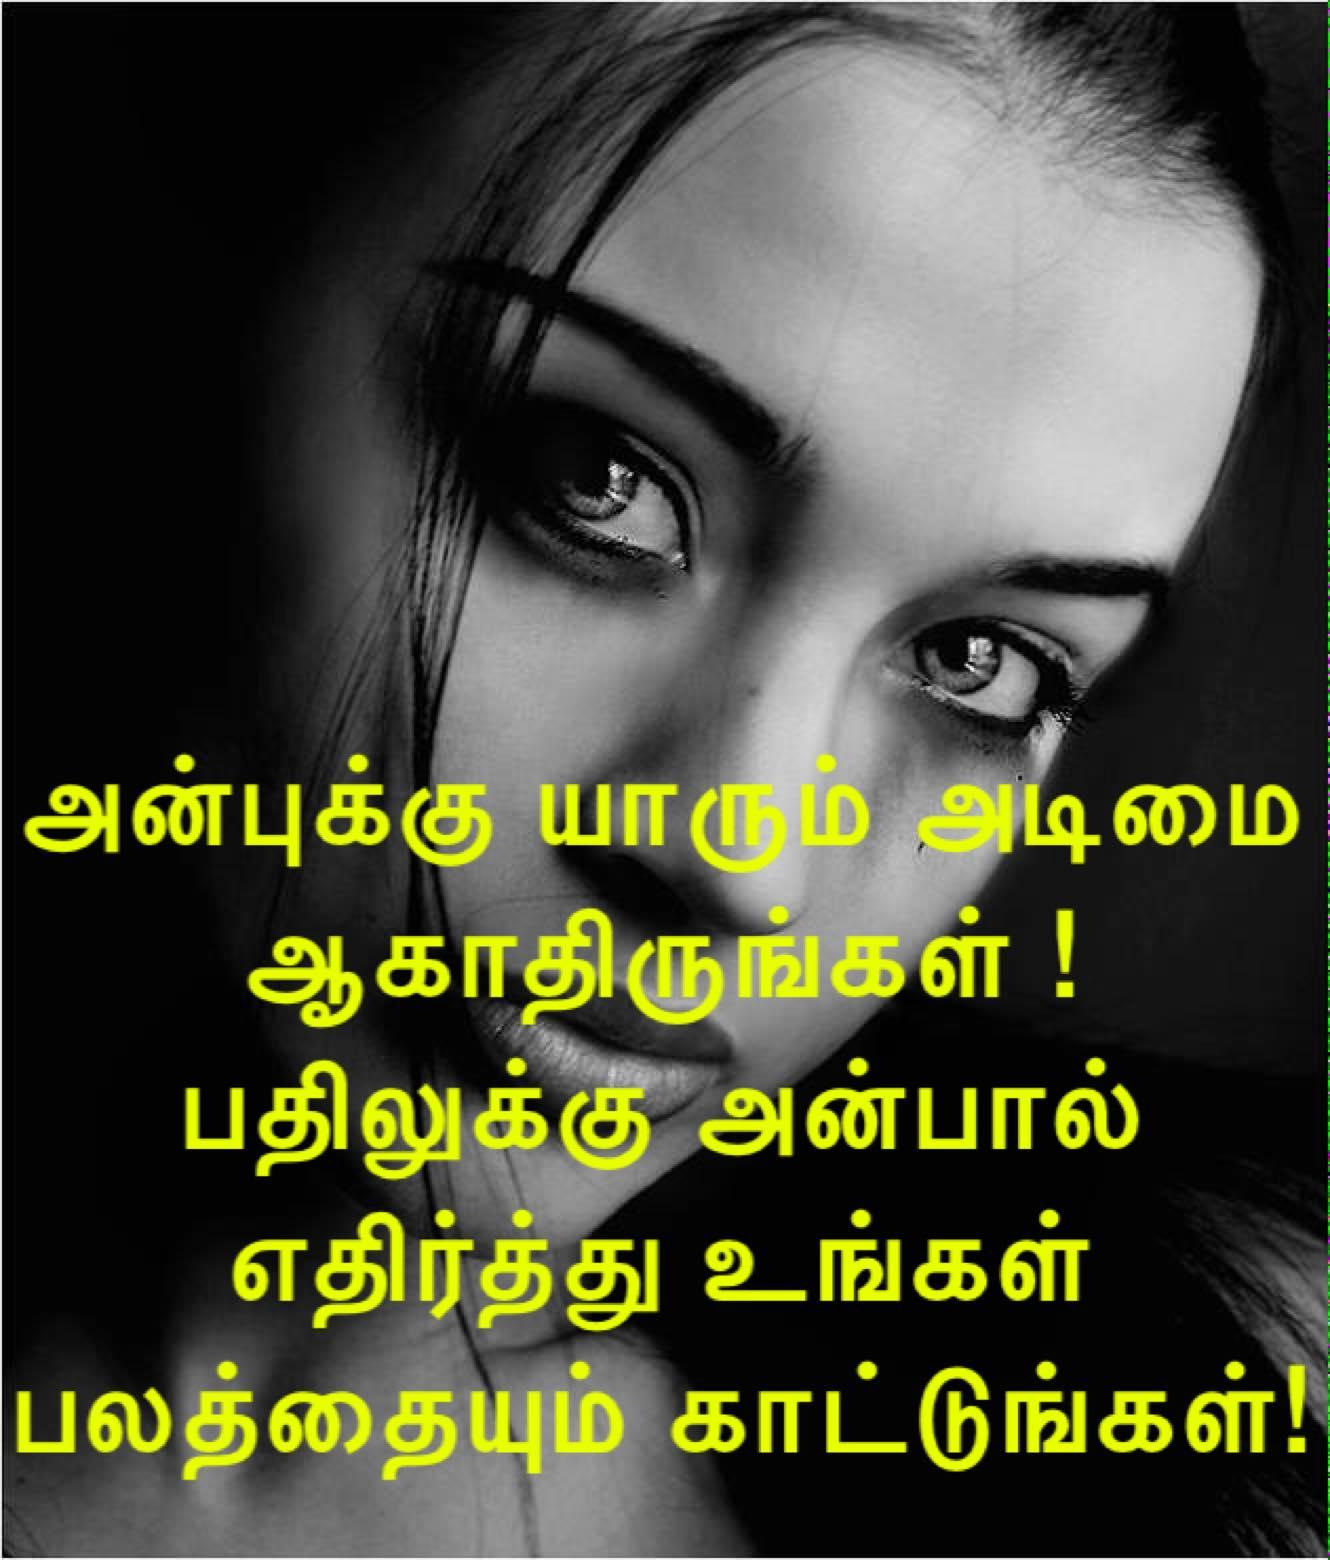 Tamil Kavithai Wallpapers Free Download Wallpaper Directory